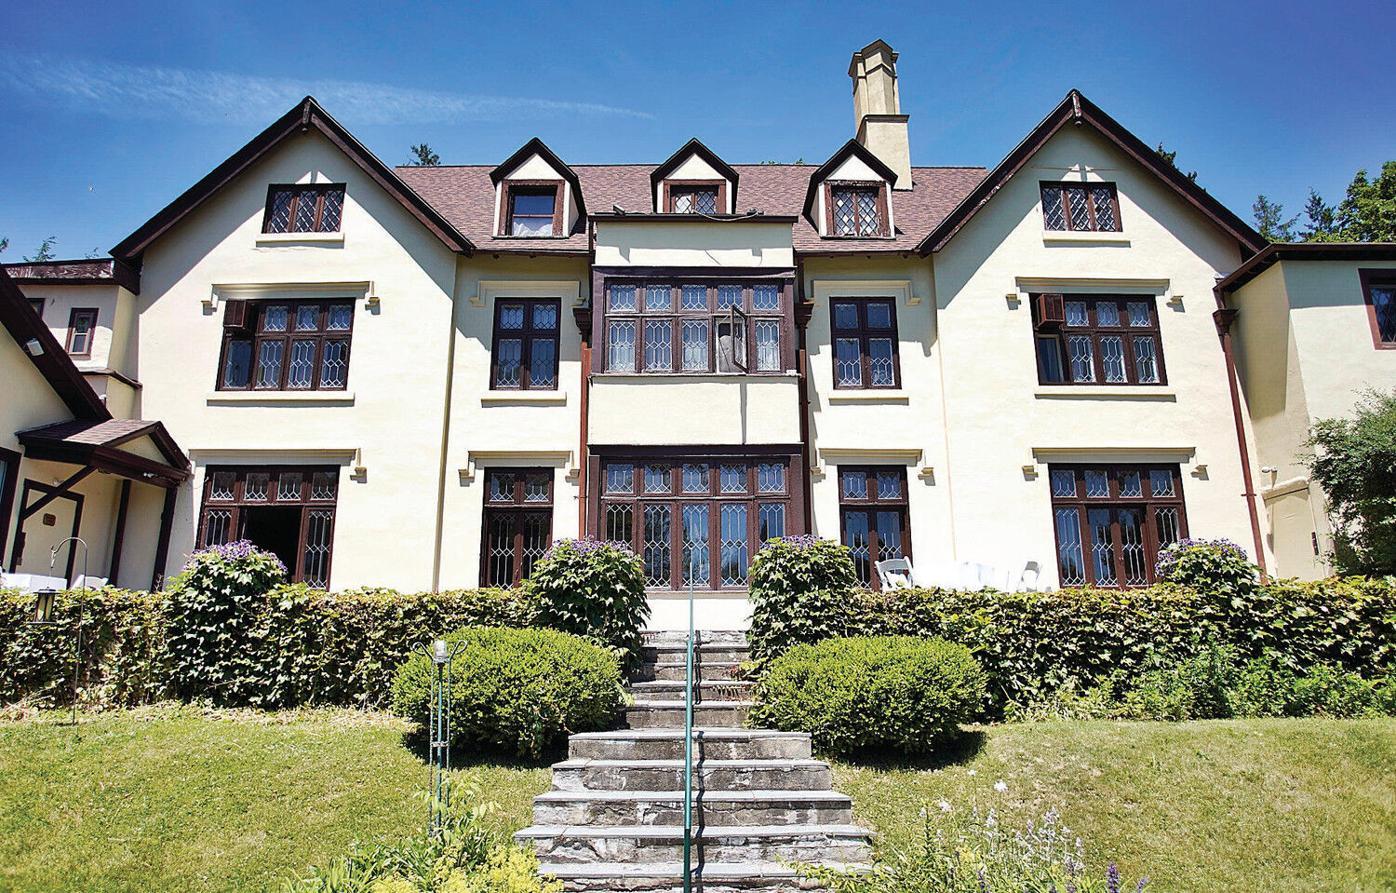 Lenox inn to get $2.2M upgrade under new owner